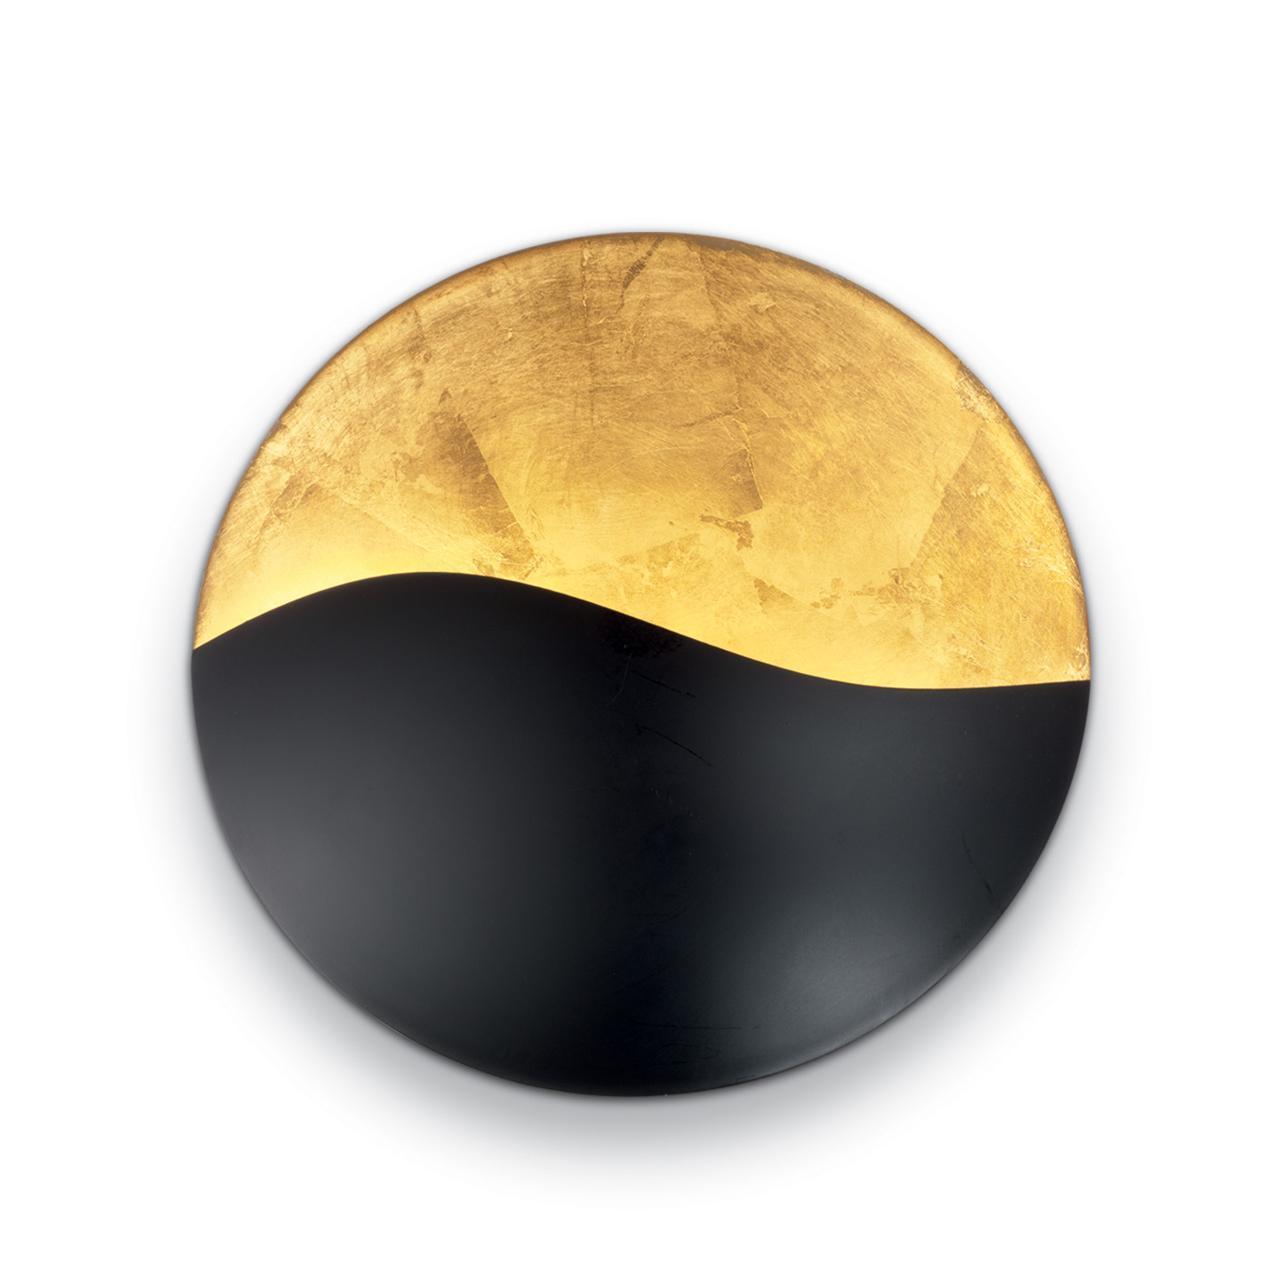 Настенный светильник Ideal Lux Sunrise AP3 Nero E Oro oro nero пиджак